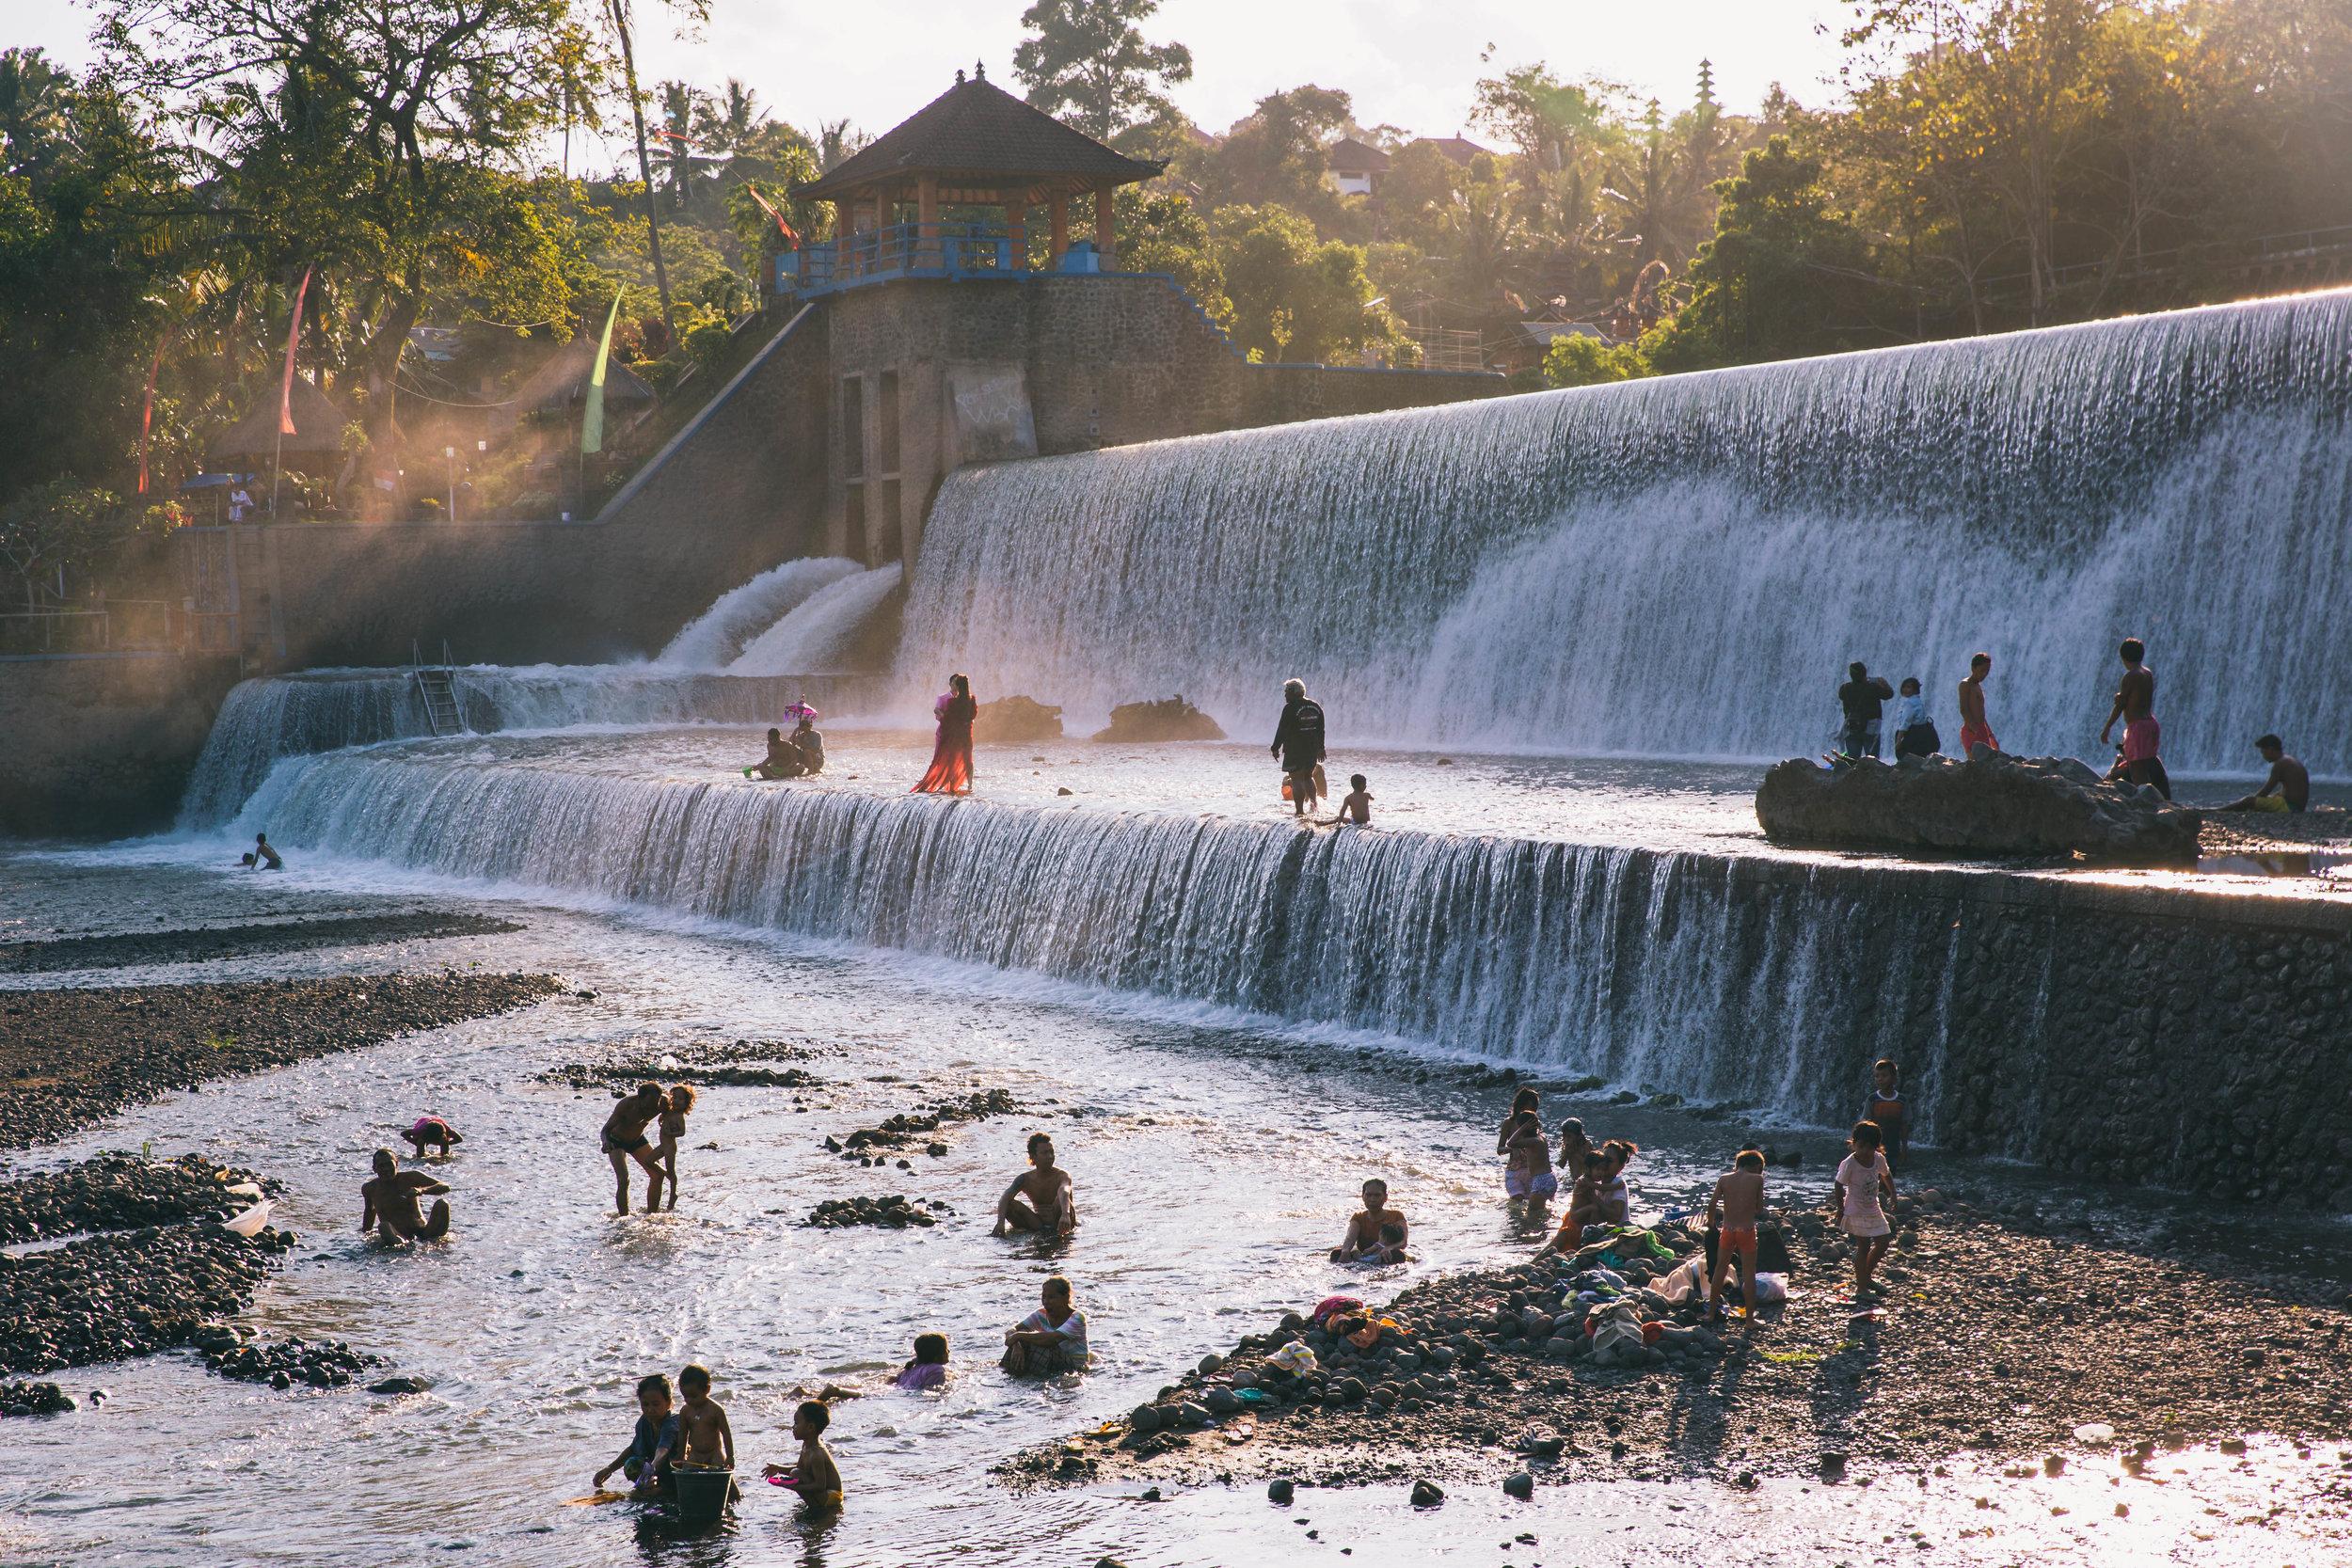 20180615-Bali-Katelyn-Wang-0402.jpg